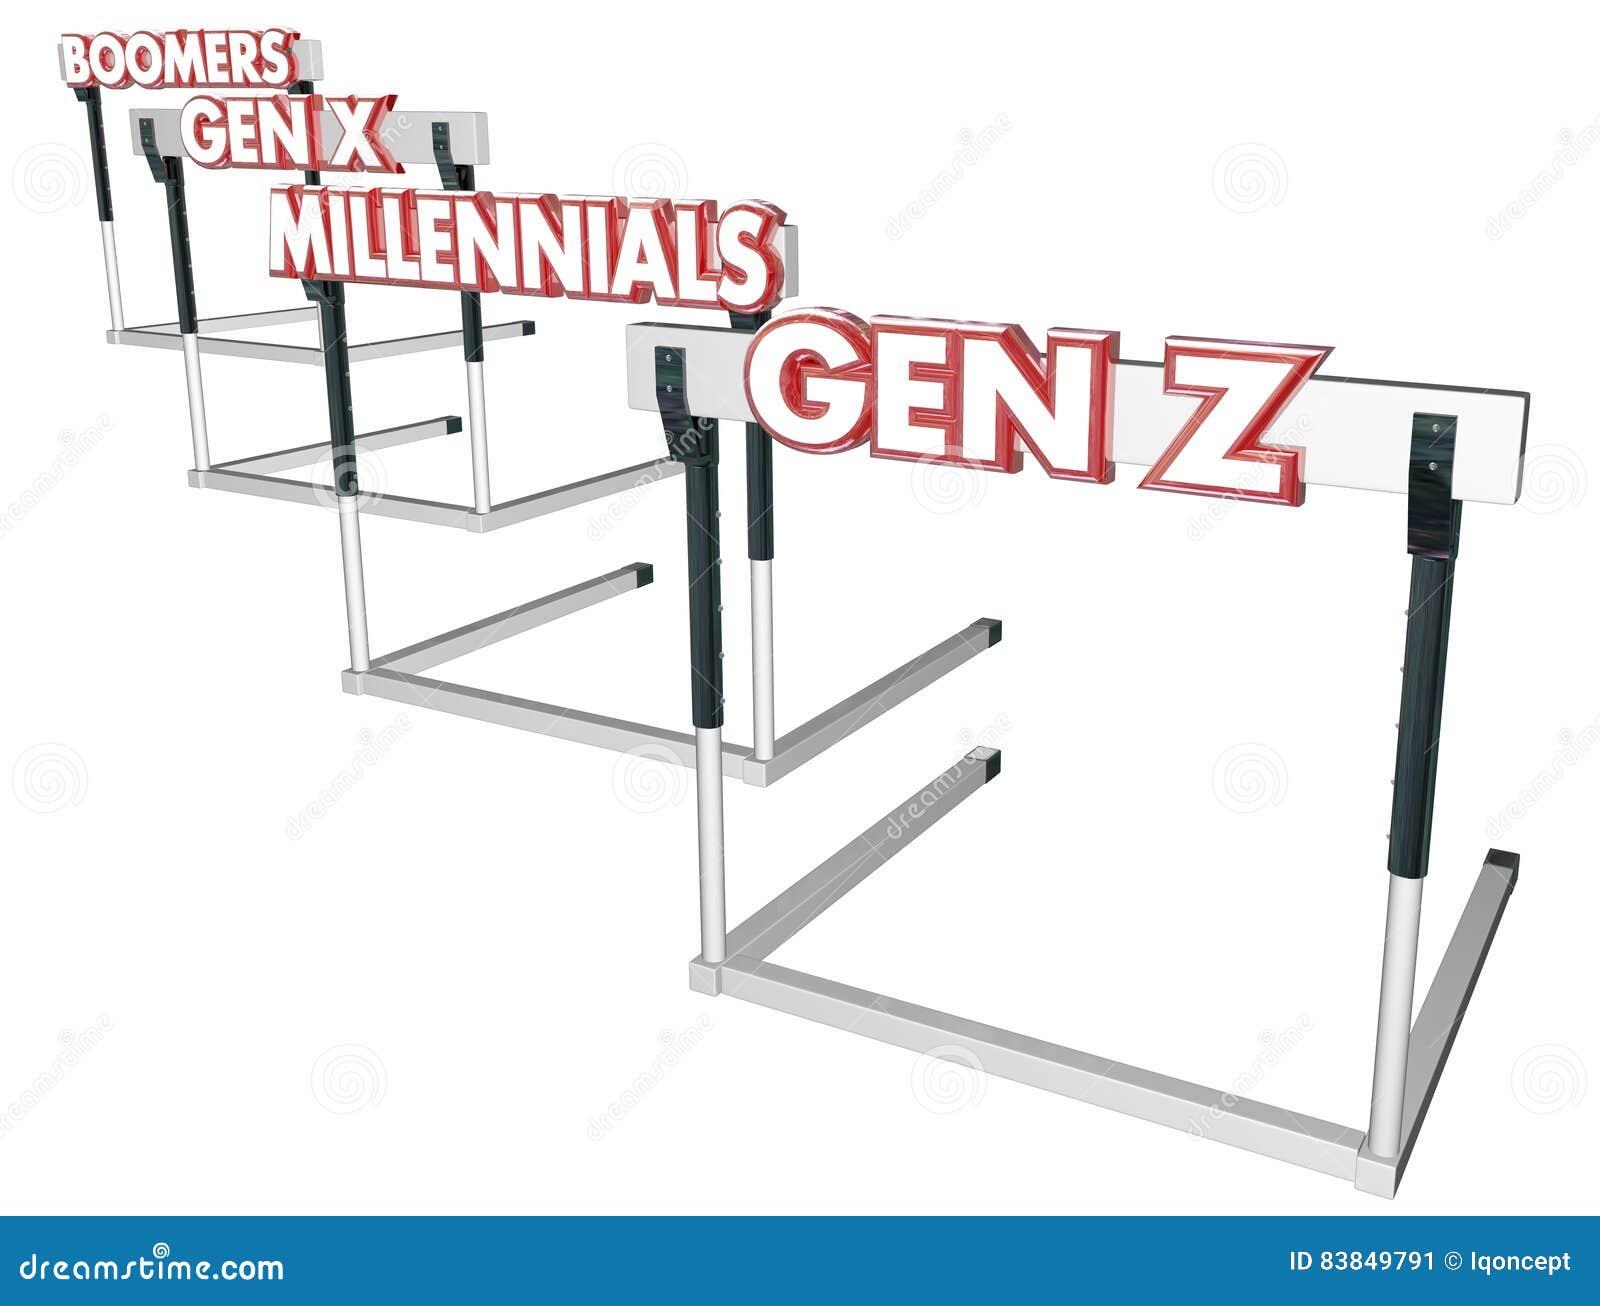 GEN Z Hurdles de la génération X Millennials de boomers